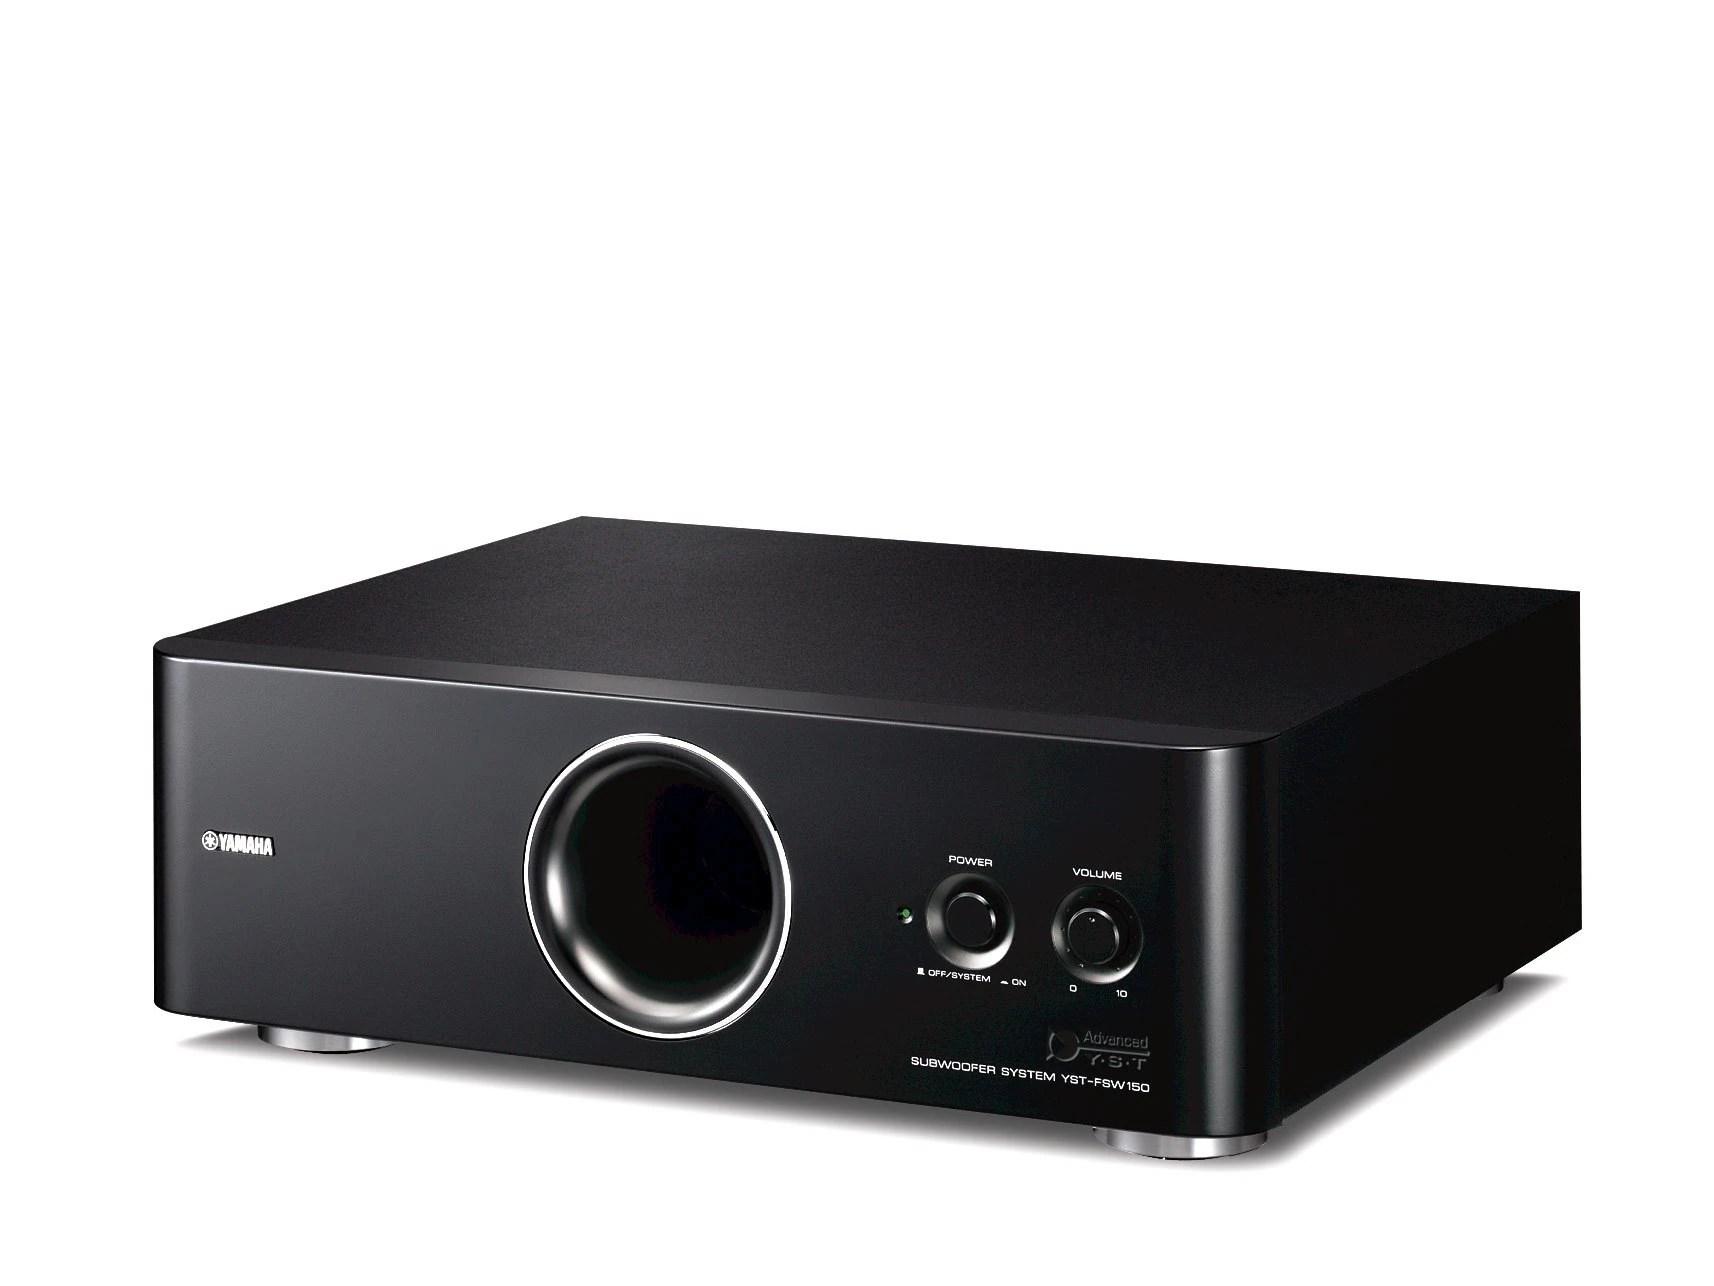 YSTFSW150 Overzicht Luidsprekers Systemen Audio